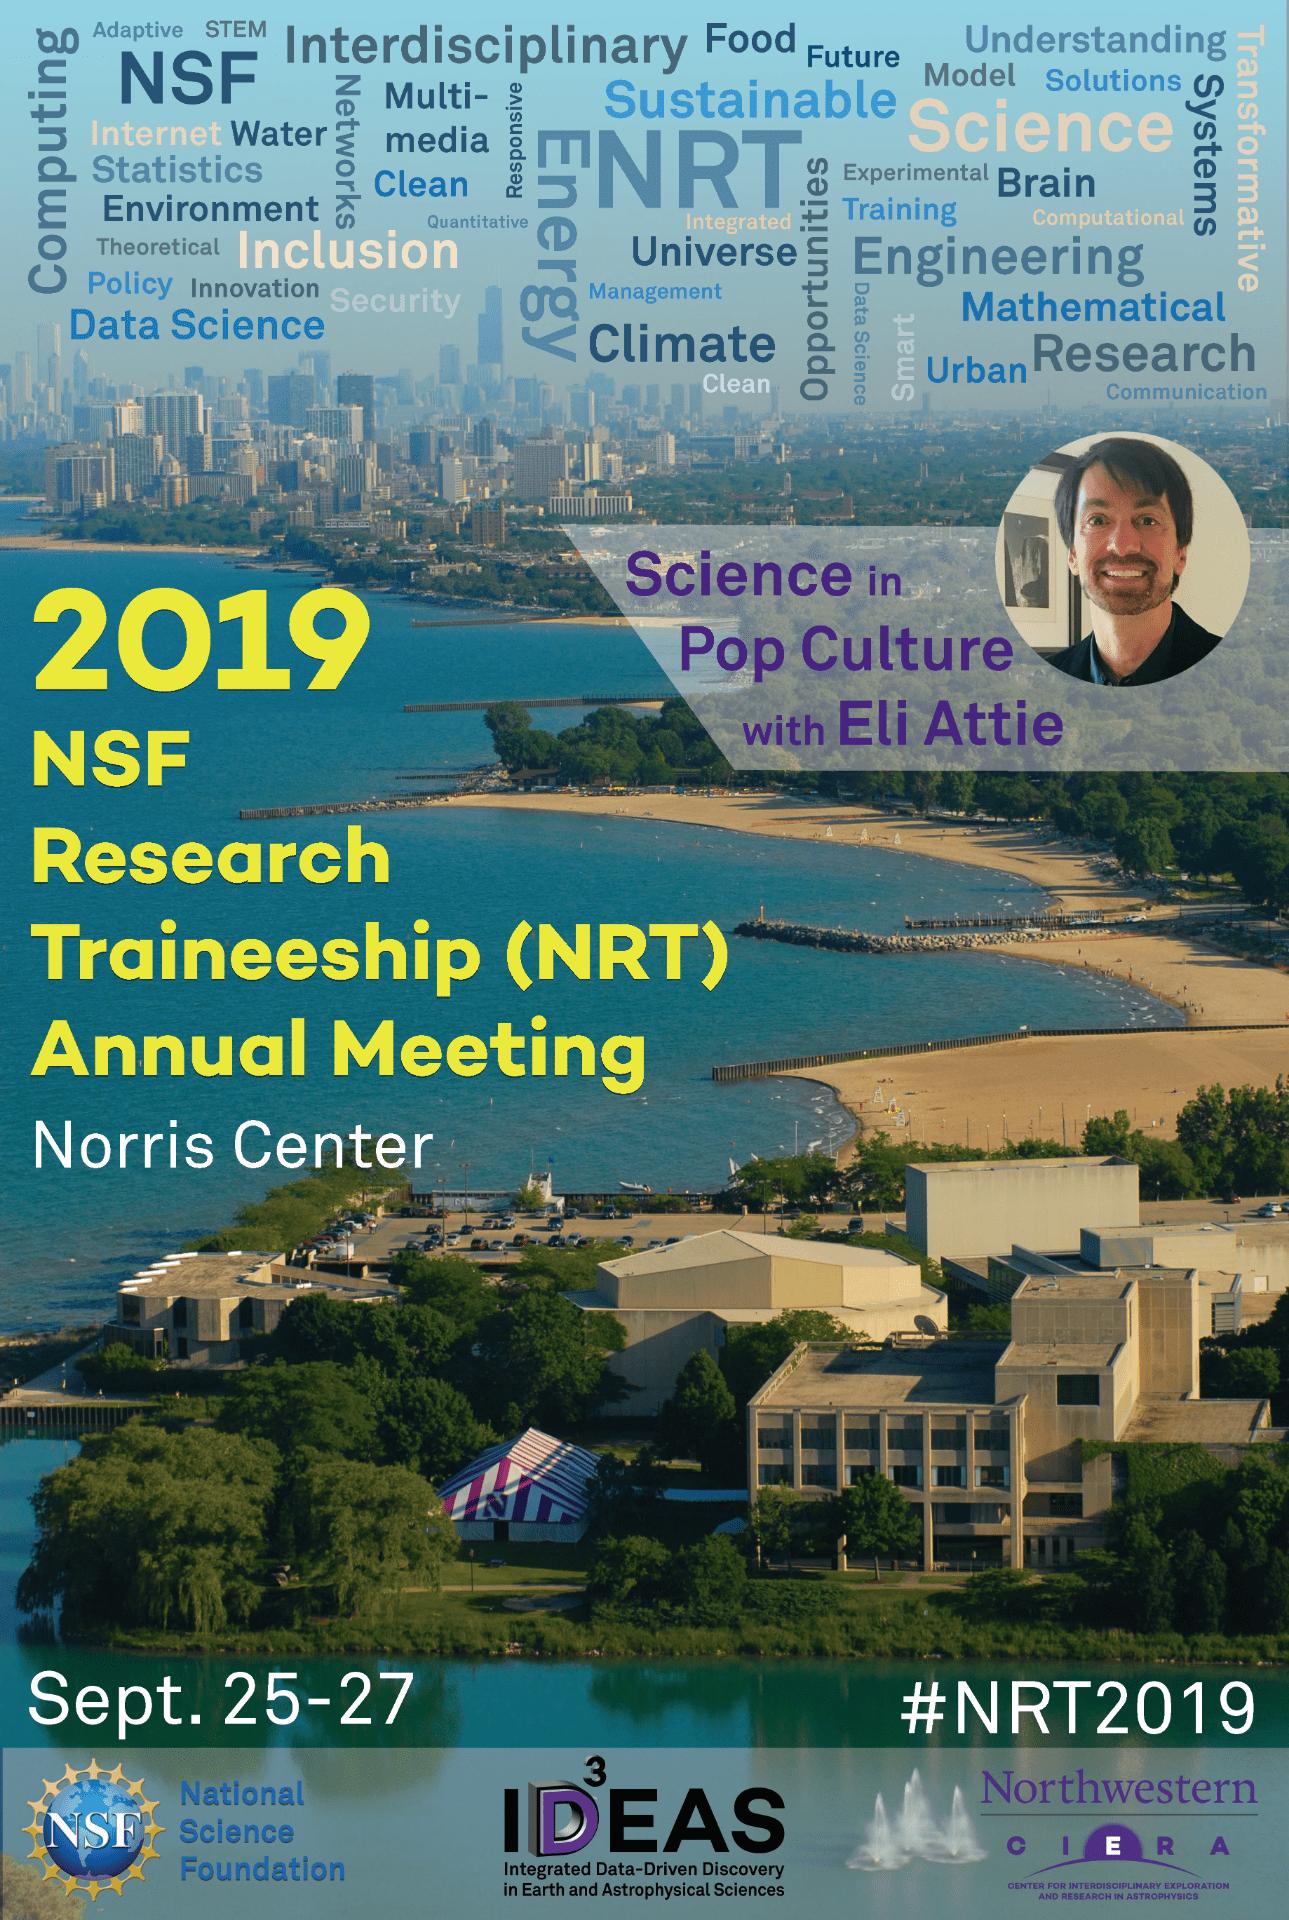 NRT Meeting Flyer